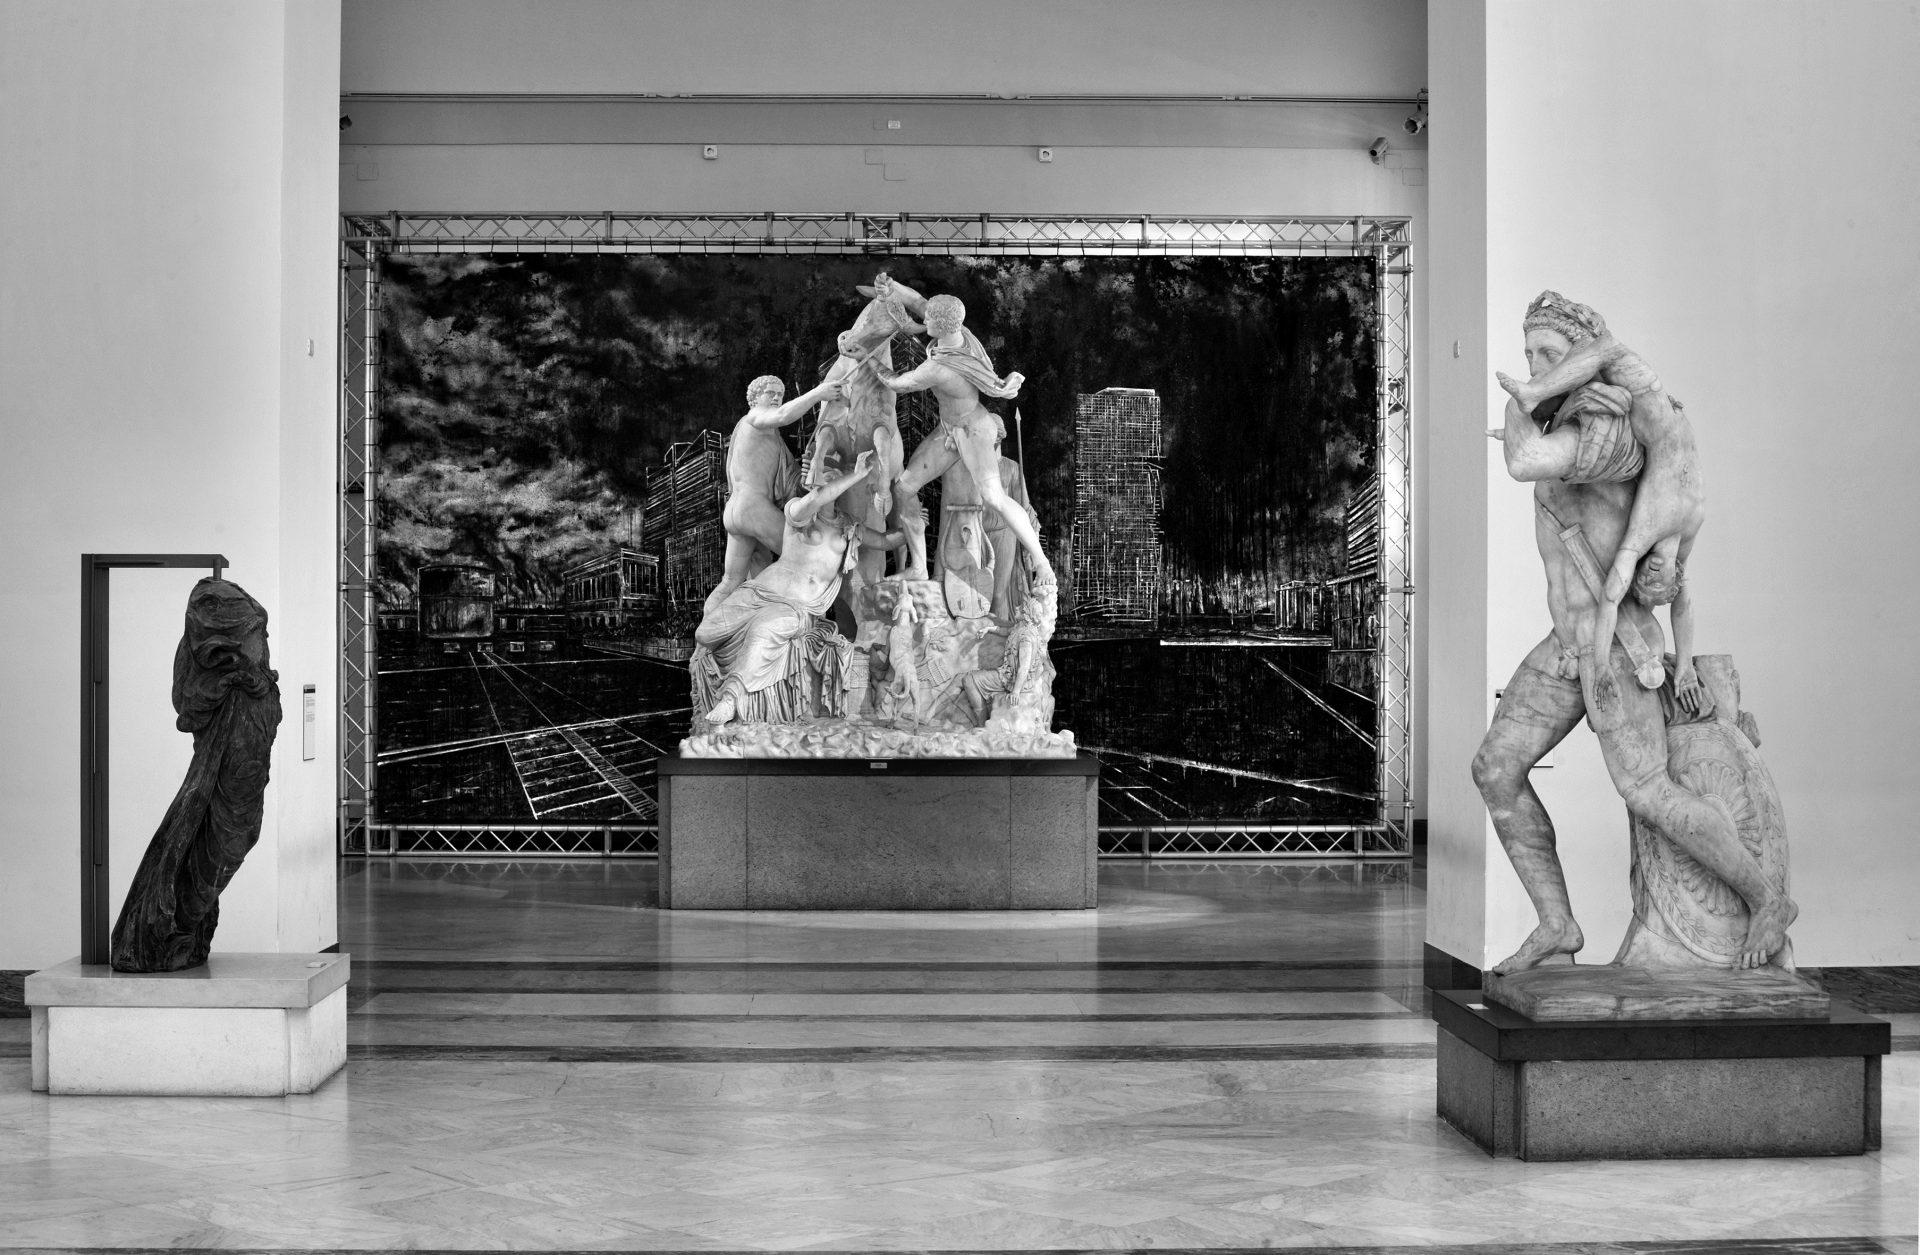 Christian Leperino, Landscapes of memory, 2012 (Sala del Toro Farnese)